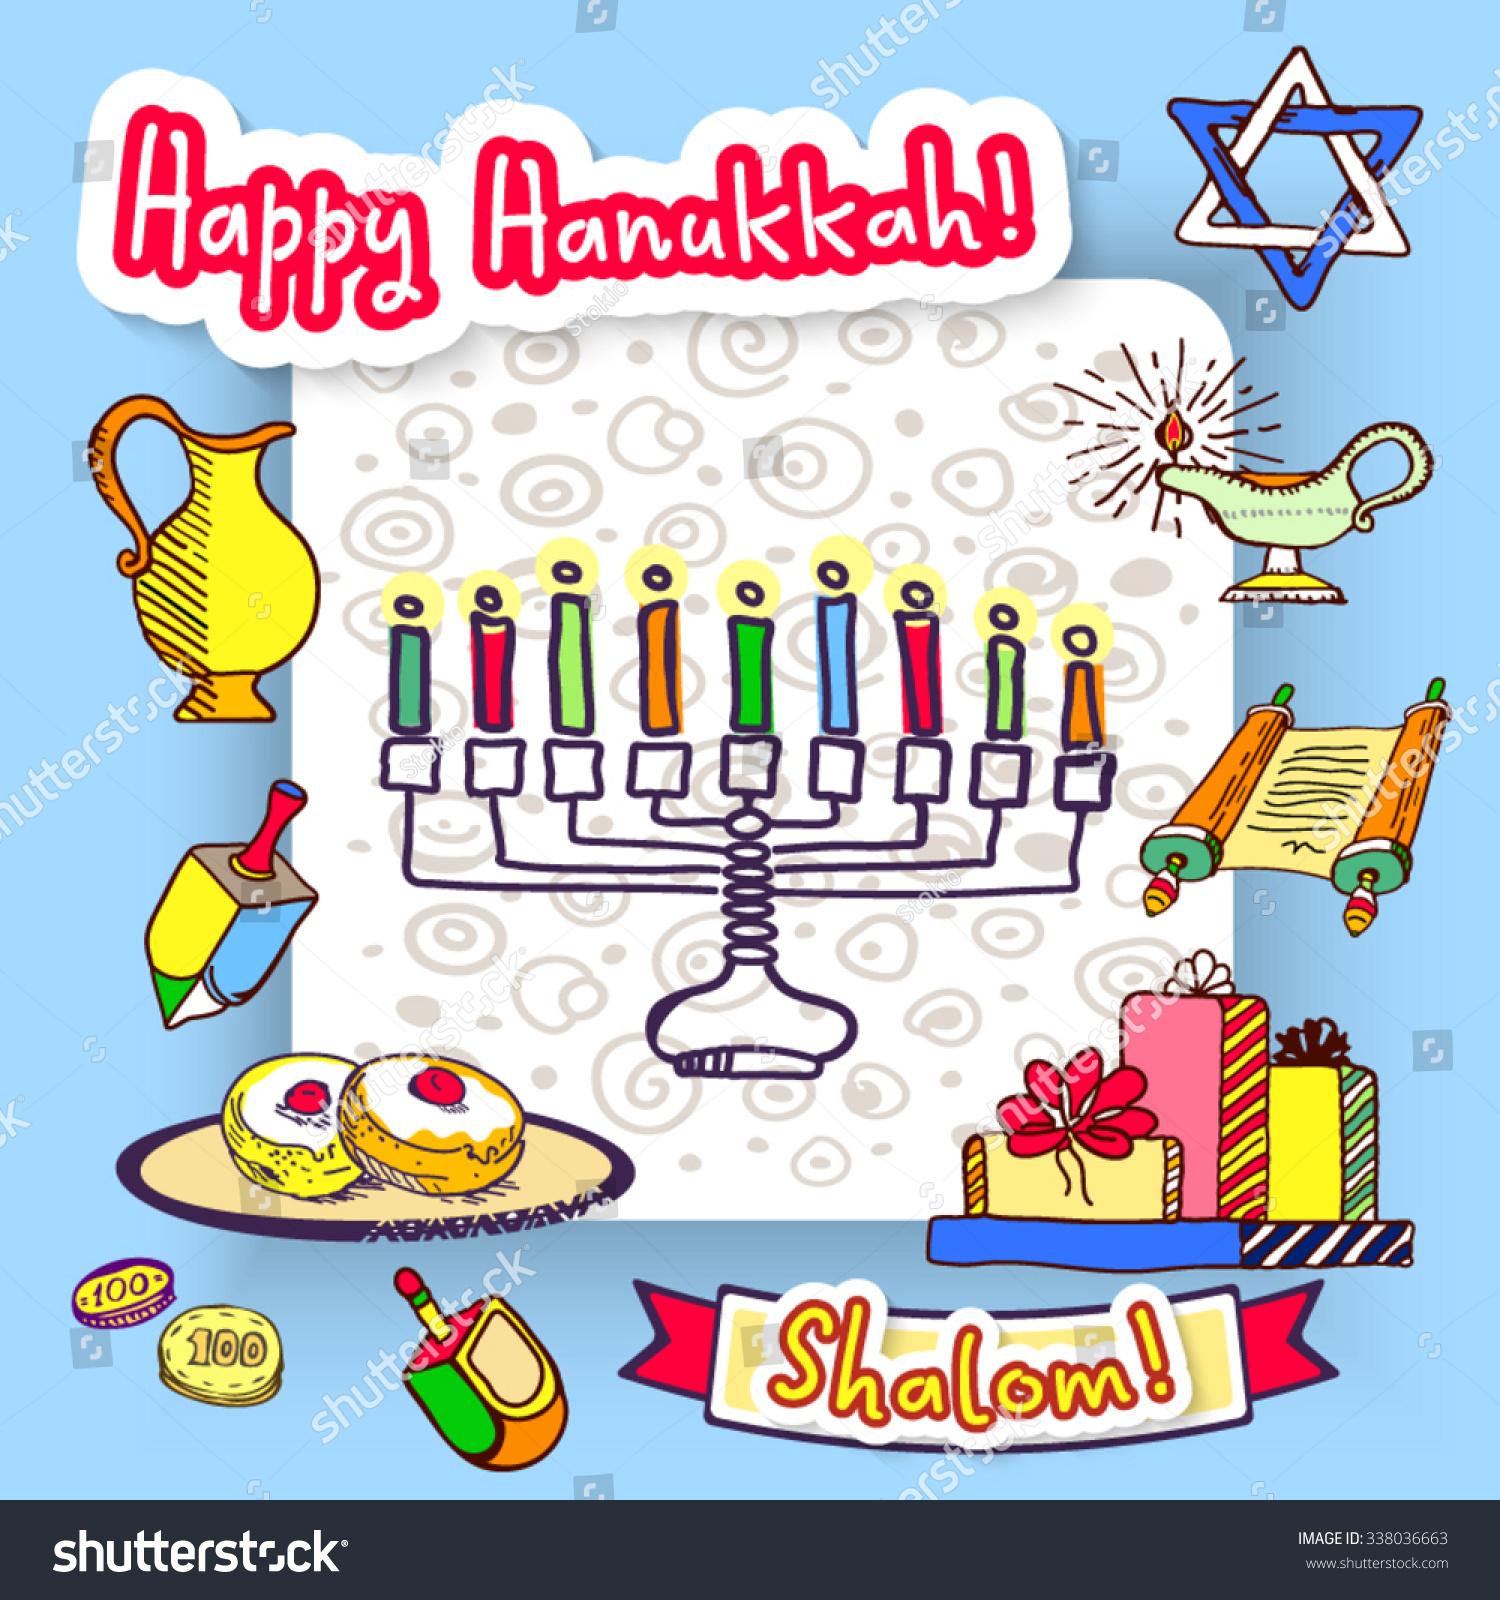 Happy Hanukkah Shalom Chanukah Traditional Jewish Stock Vector